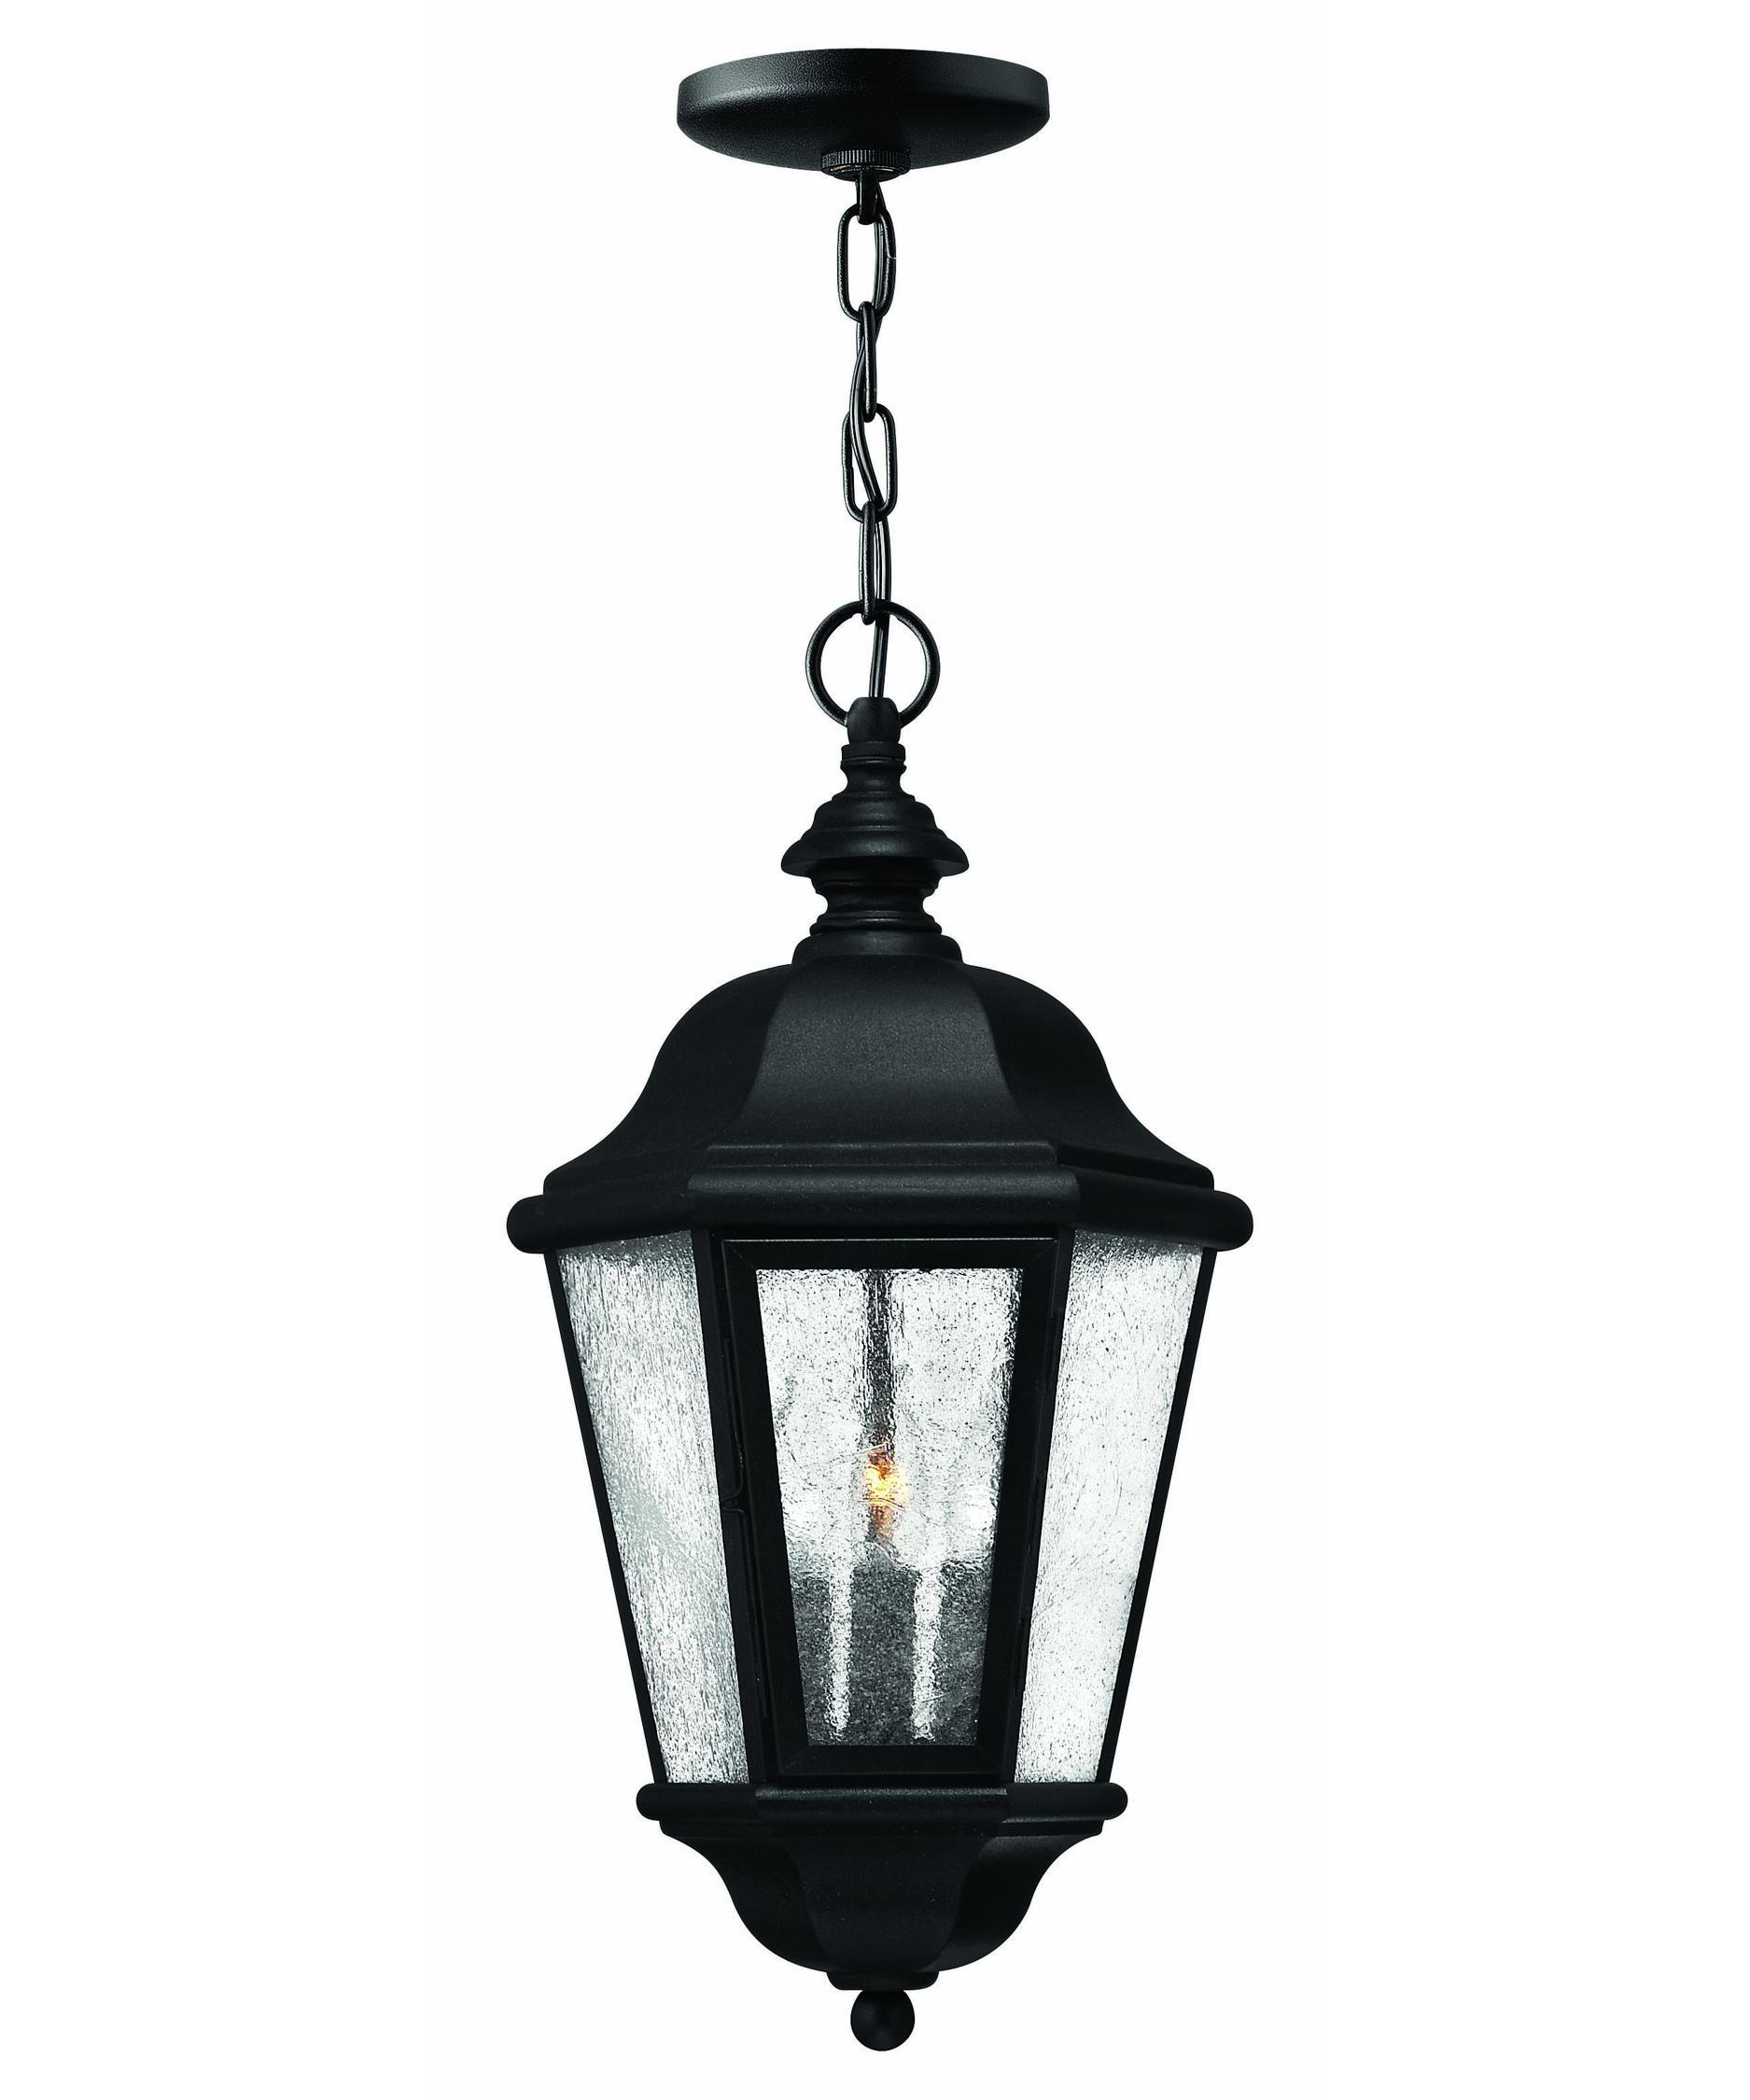 Popular Photo of Outdoor Hanging Lantern Lights